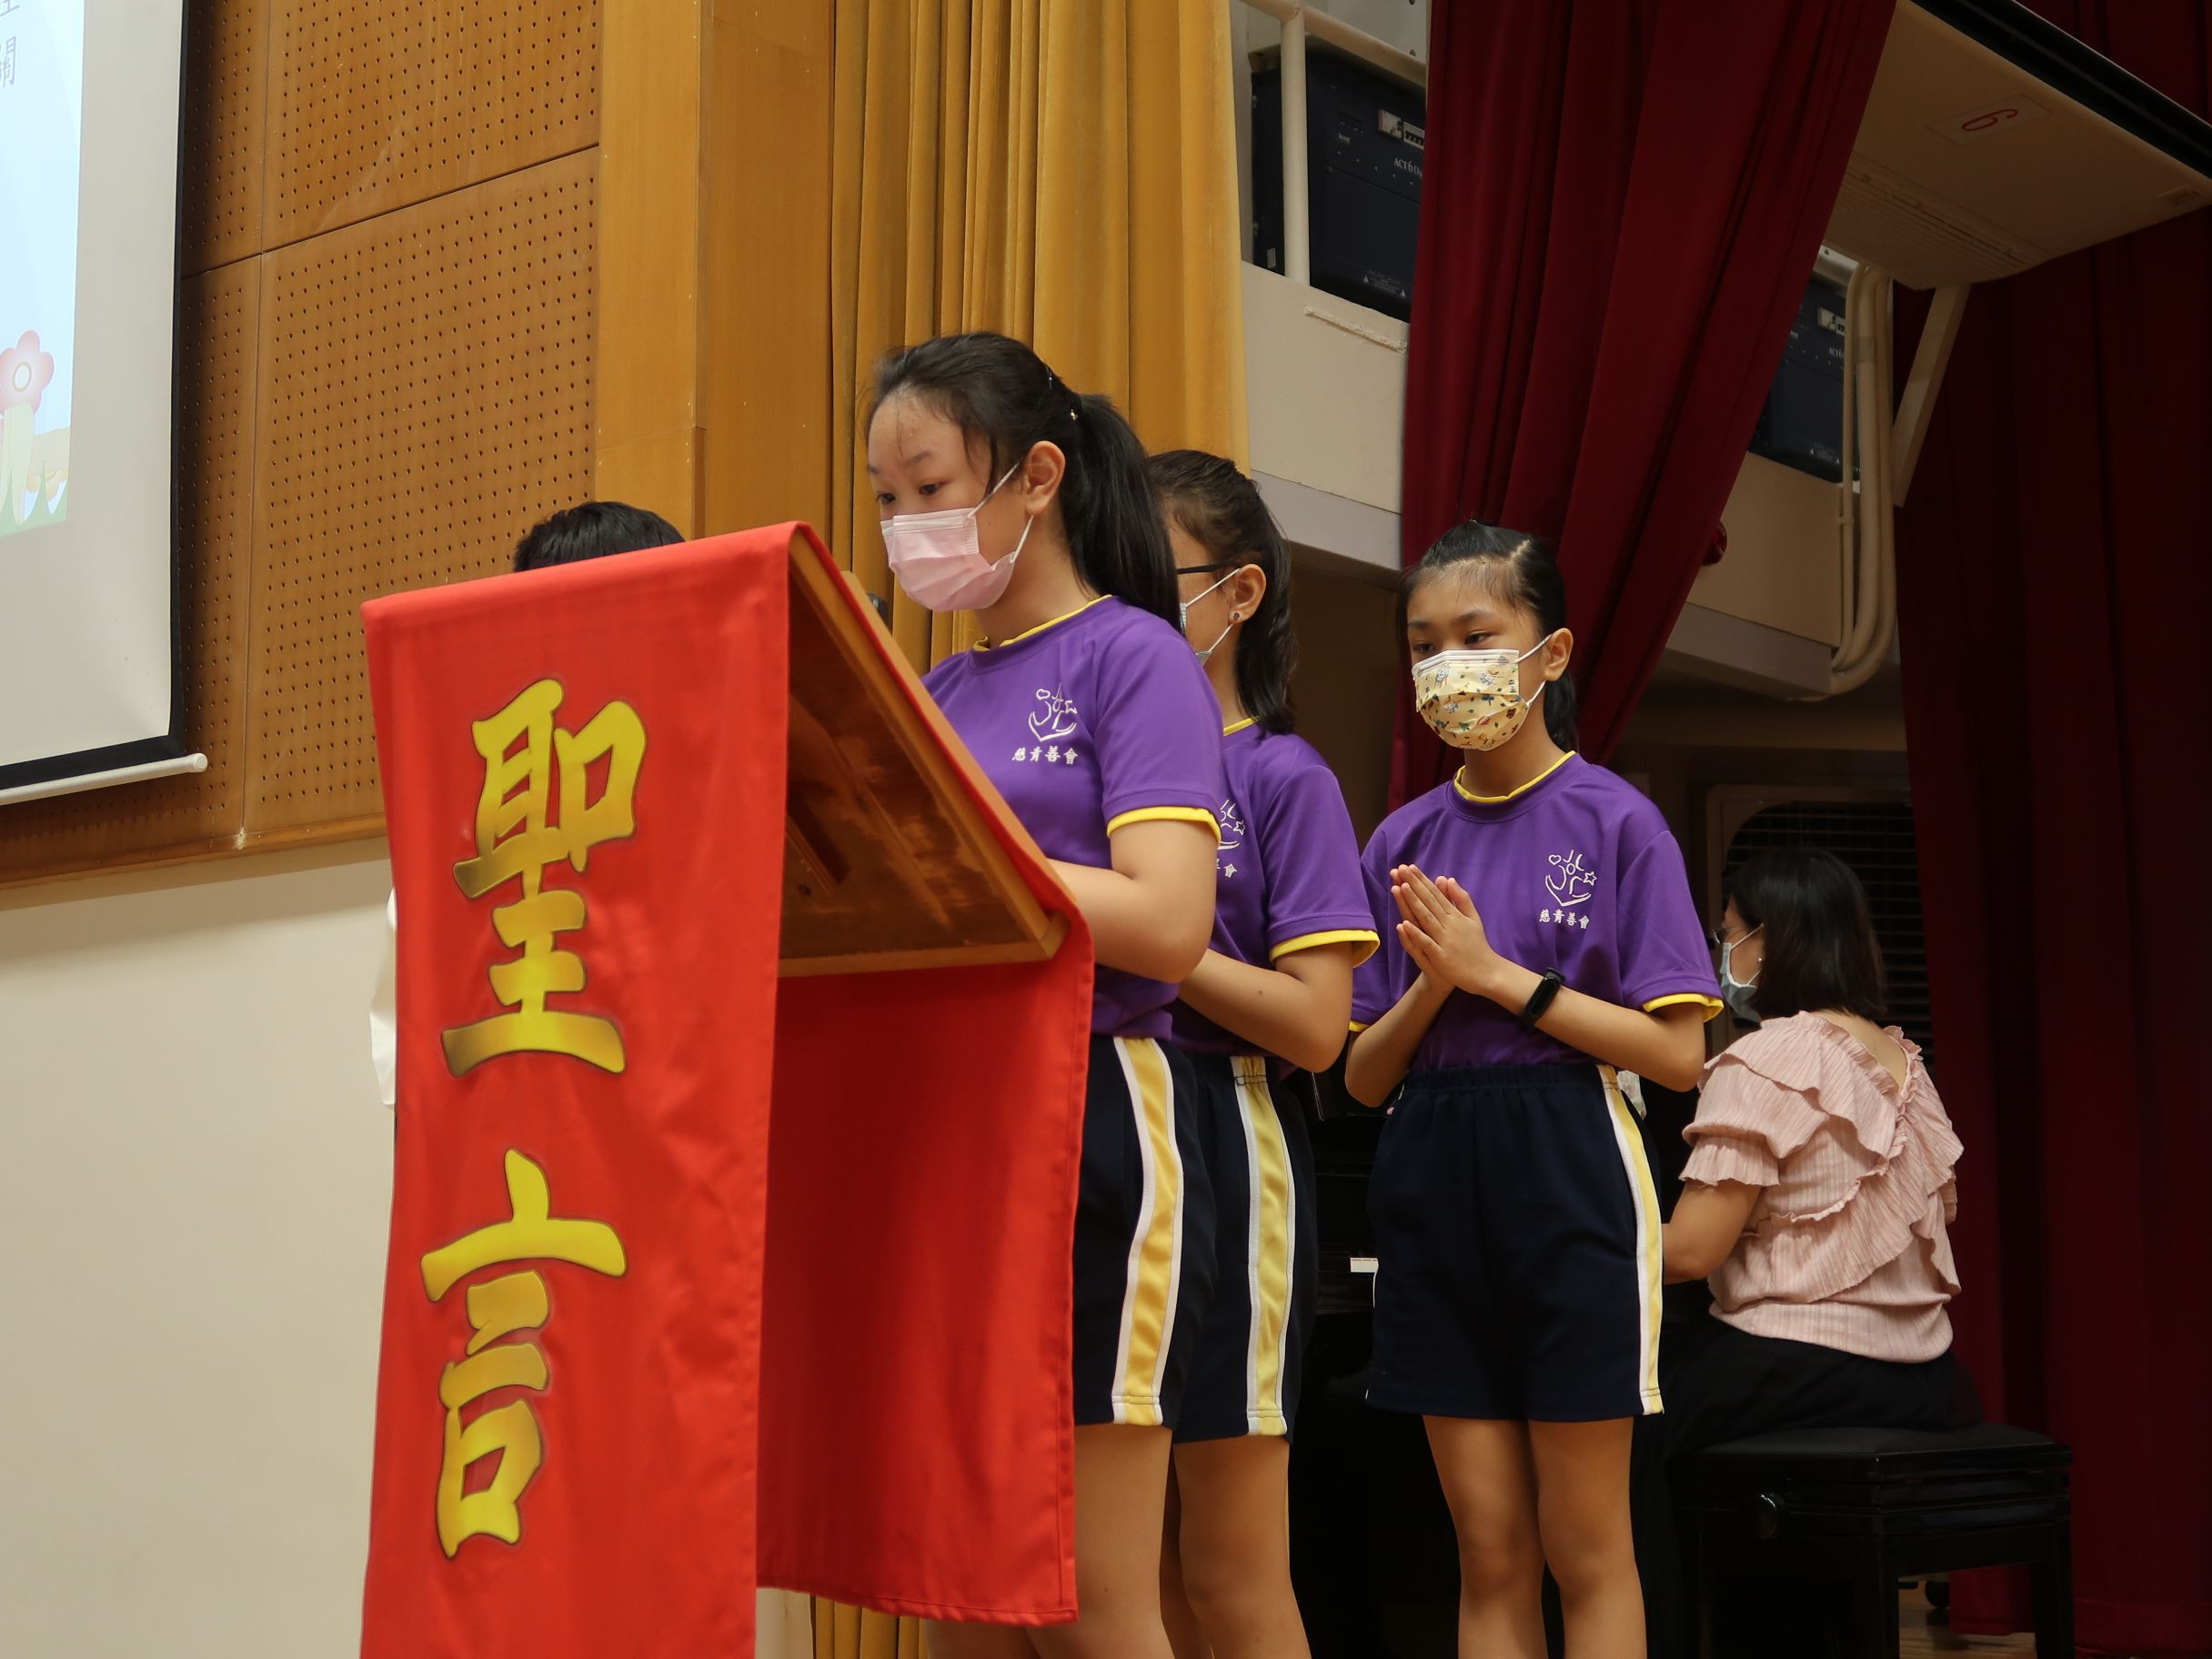 https://syh.edu.hk/sites/default/files/img_7630.jpg